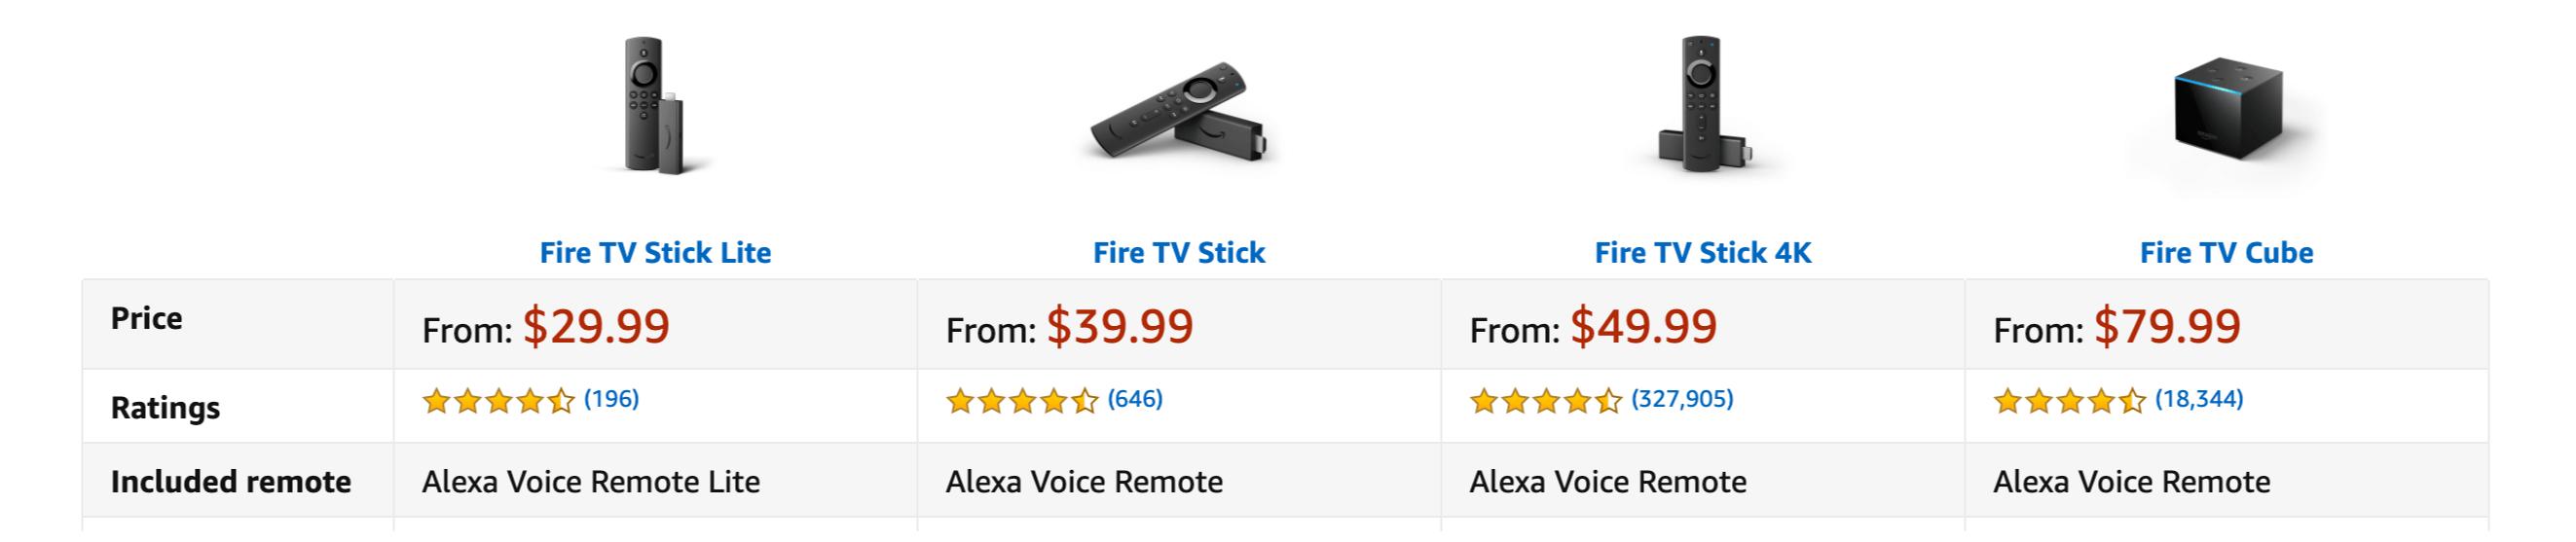 Amazon-FireTv-Sticks-Price